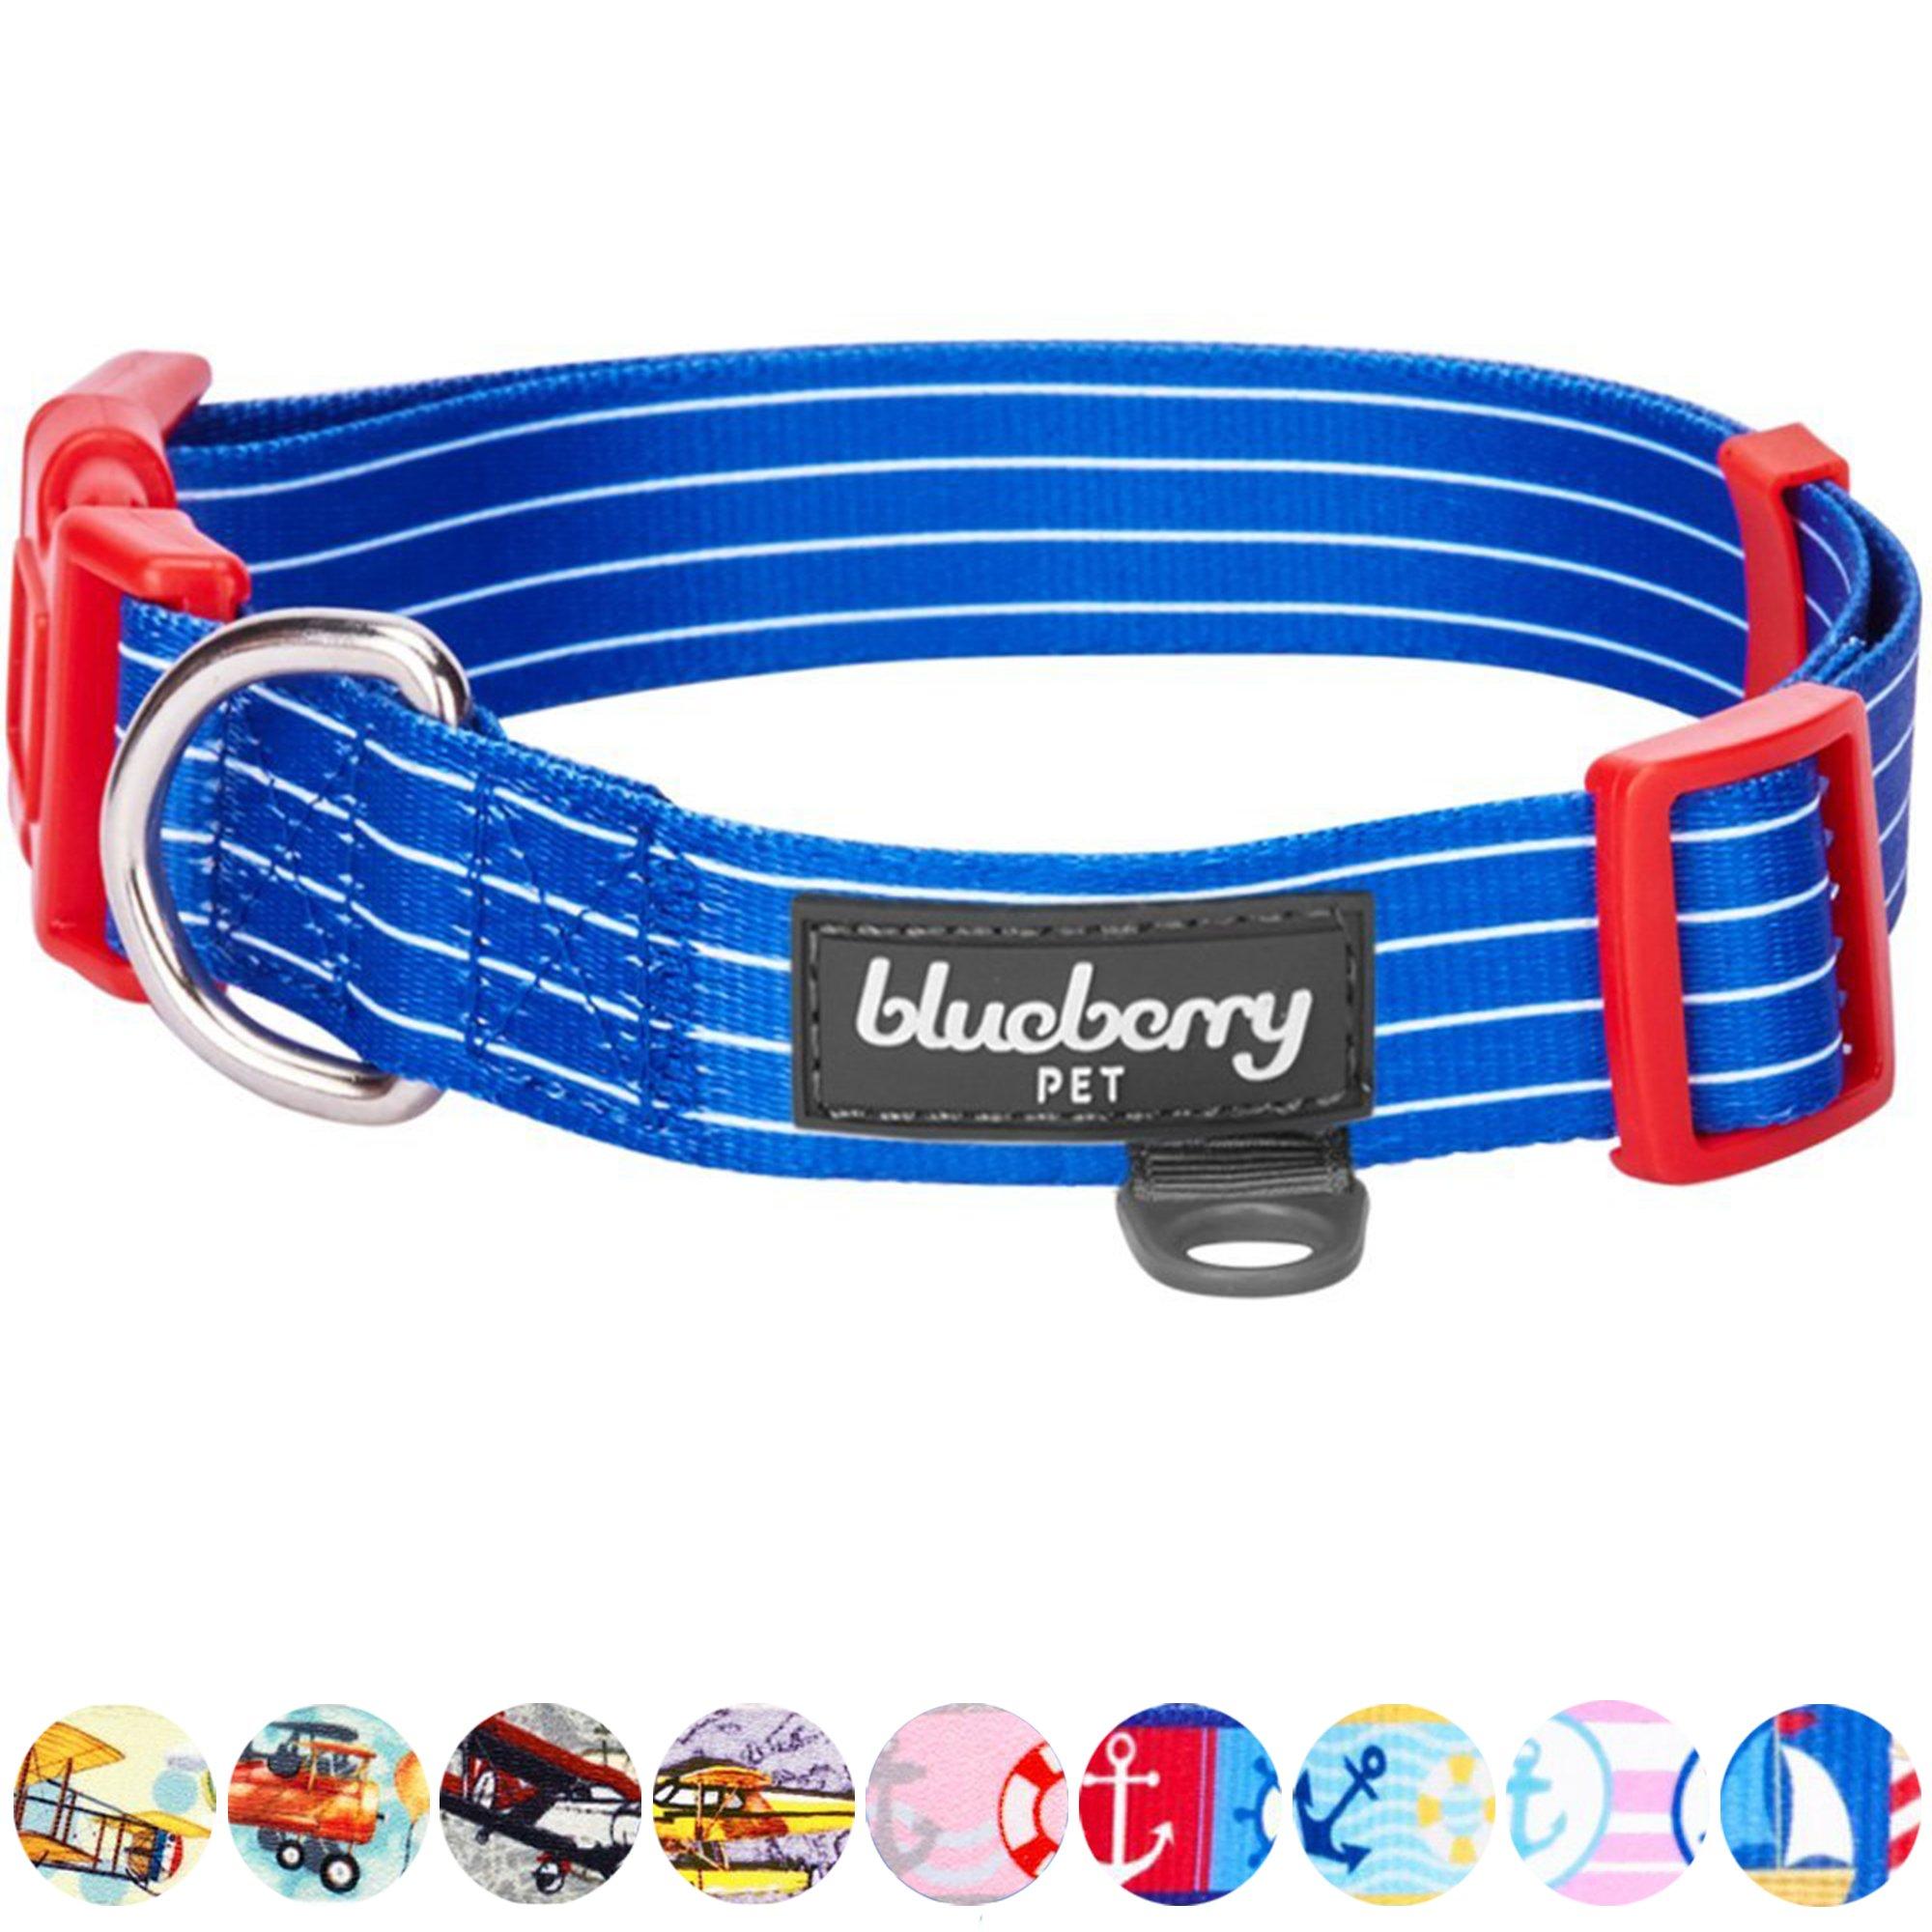 Blueberry Pet Royal Bon Voyage Nautical Sleek Wisdom Designer Dog Collar Small